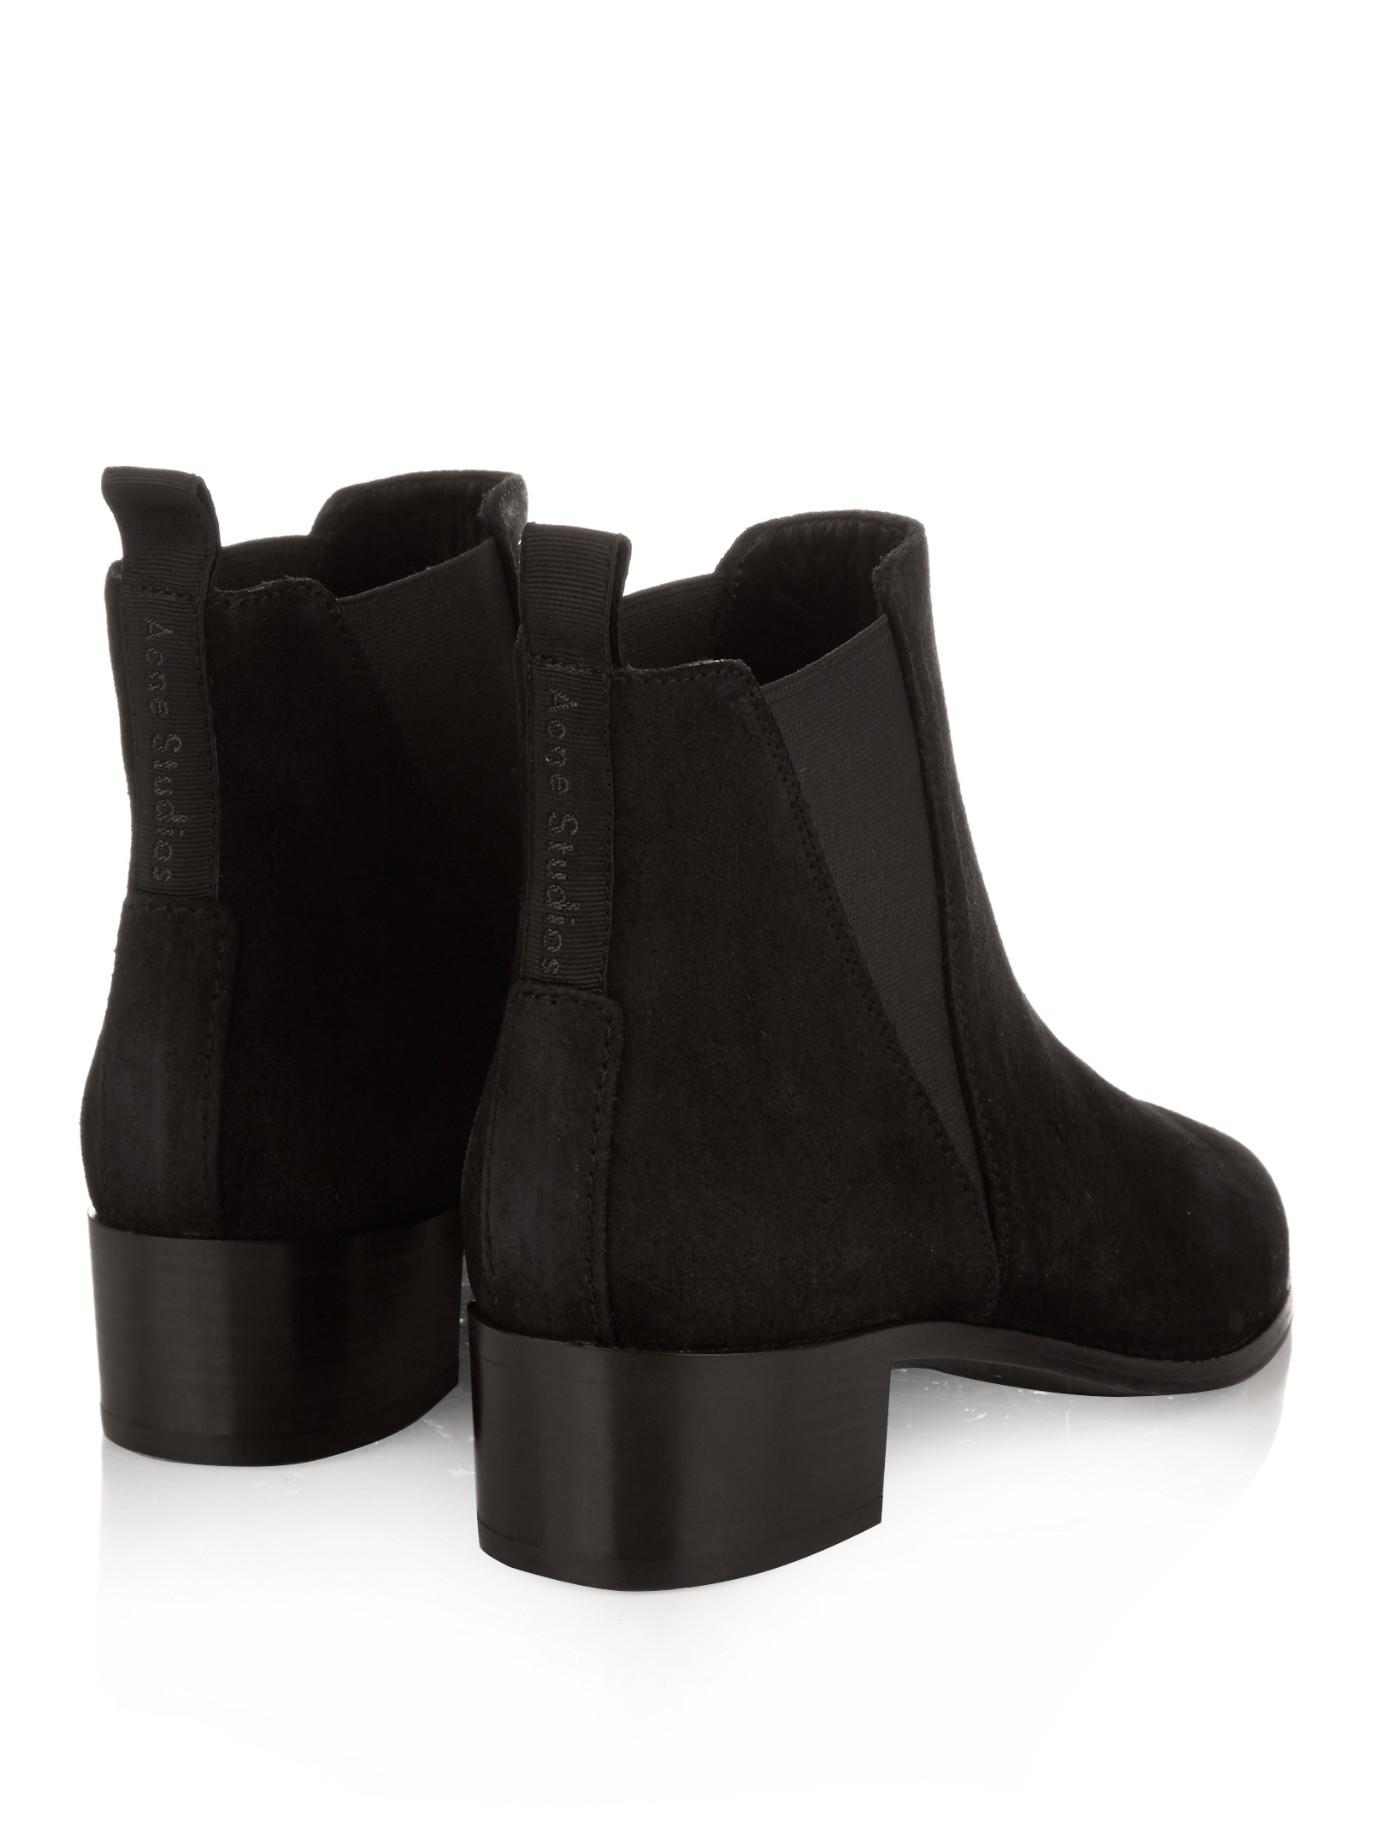 acne studios black jensen suede chelsea boots product 0 normal